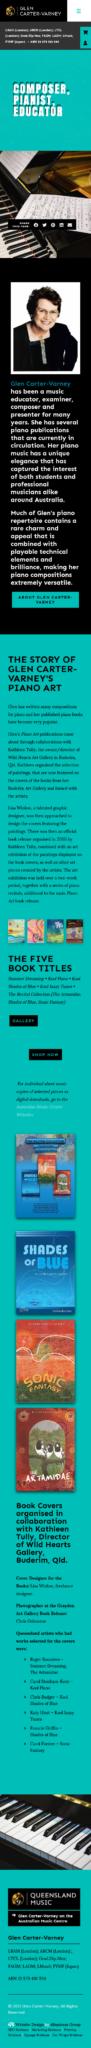 Glen Carter- Varney: Mobile View